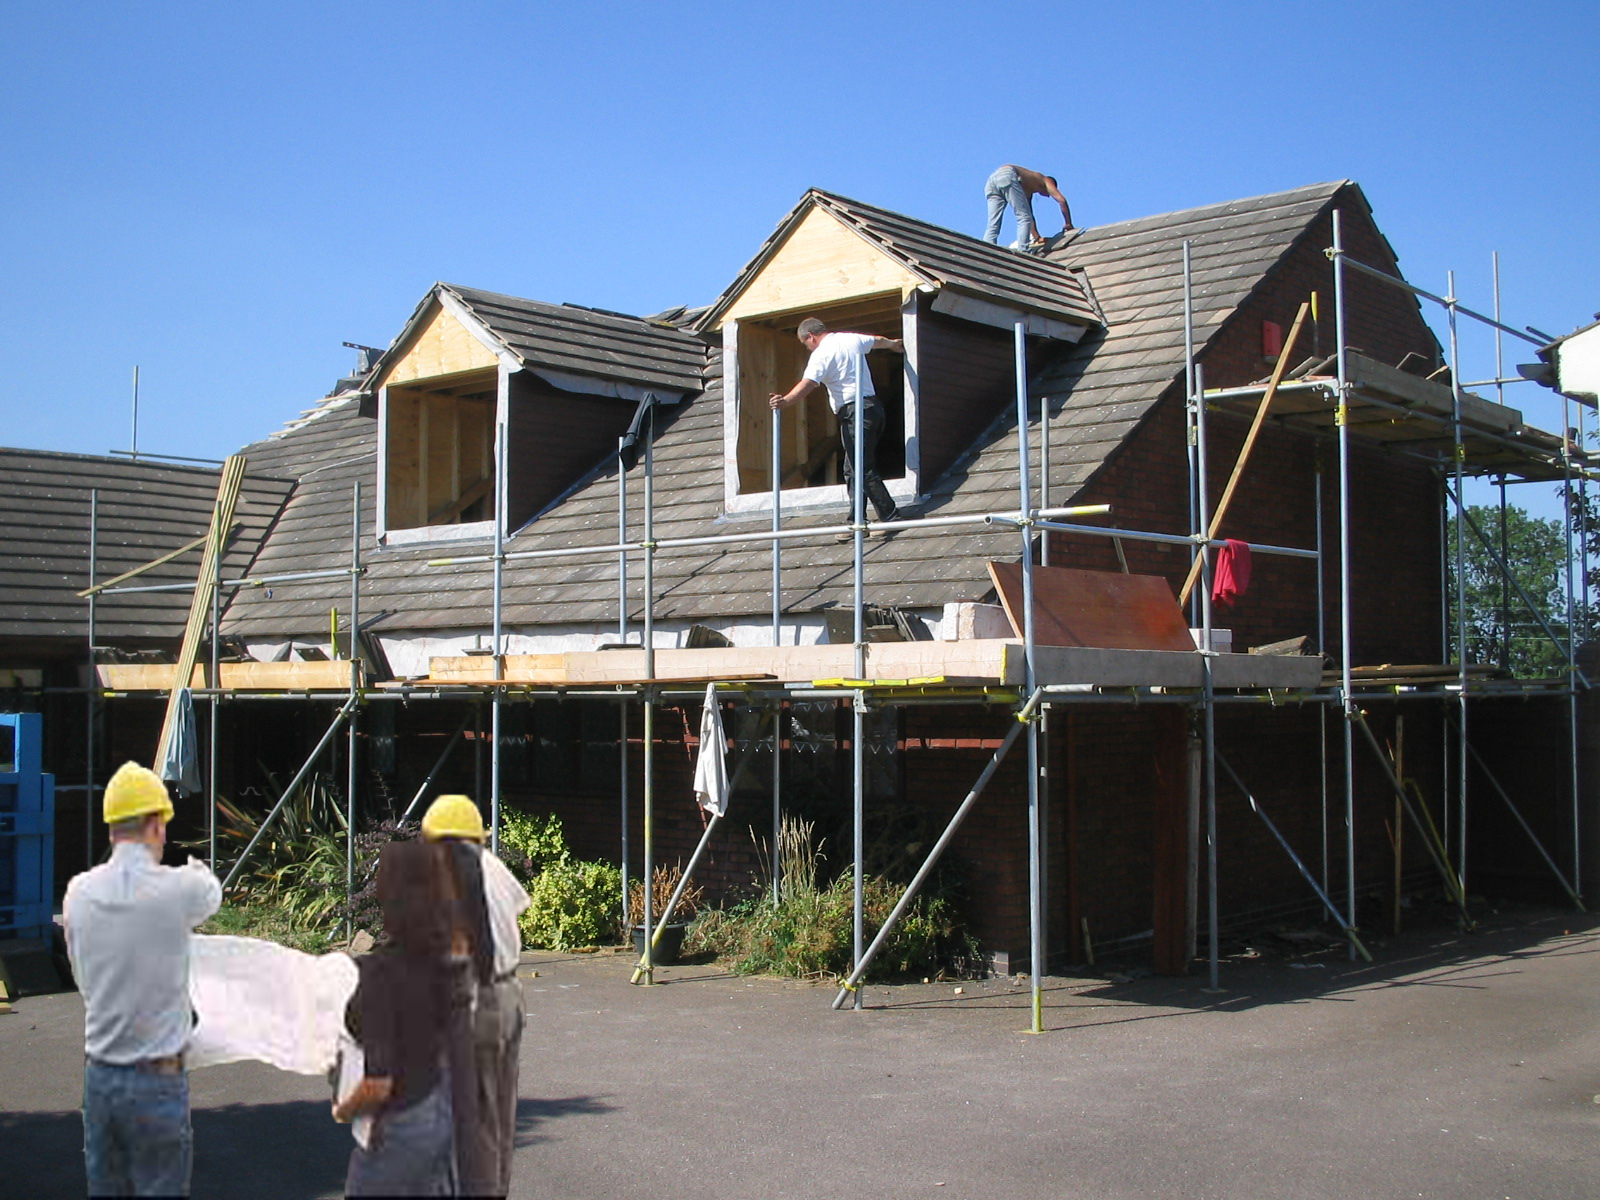 drop in number of houses built in carlow